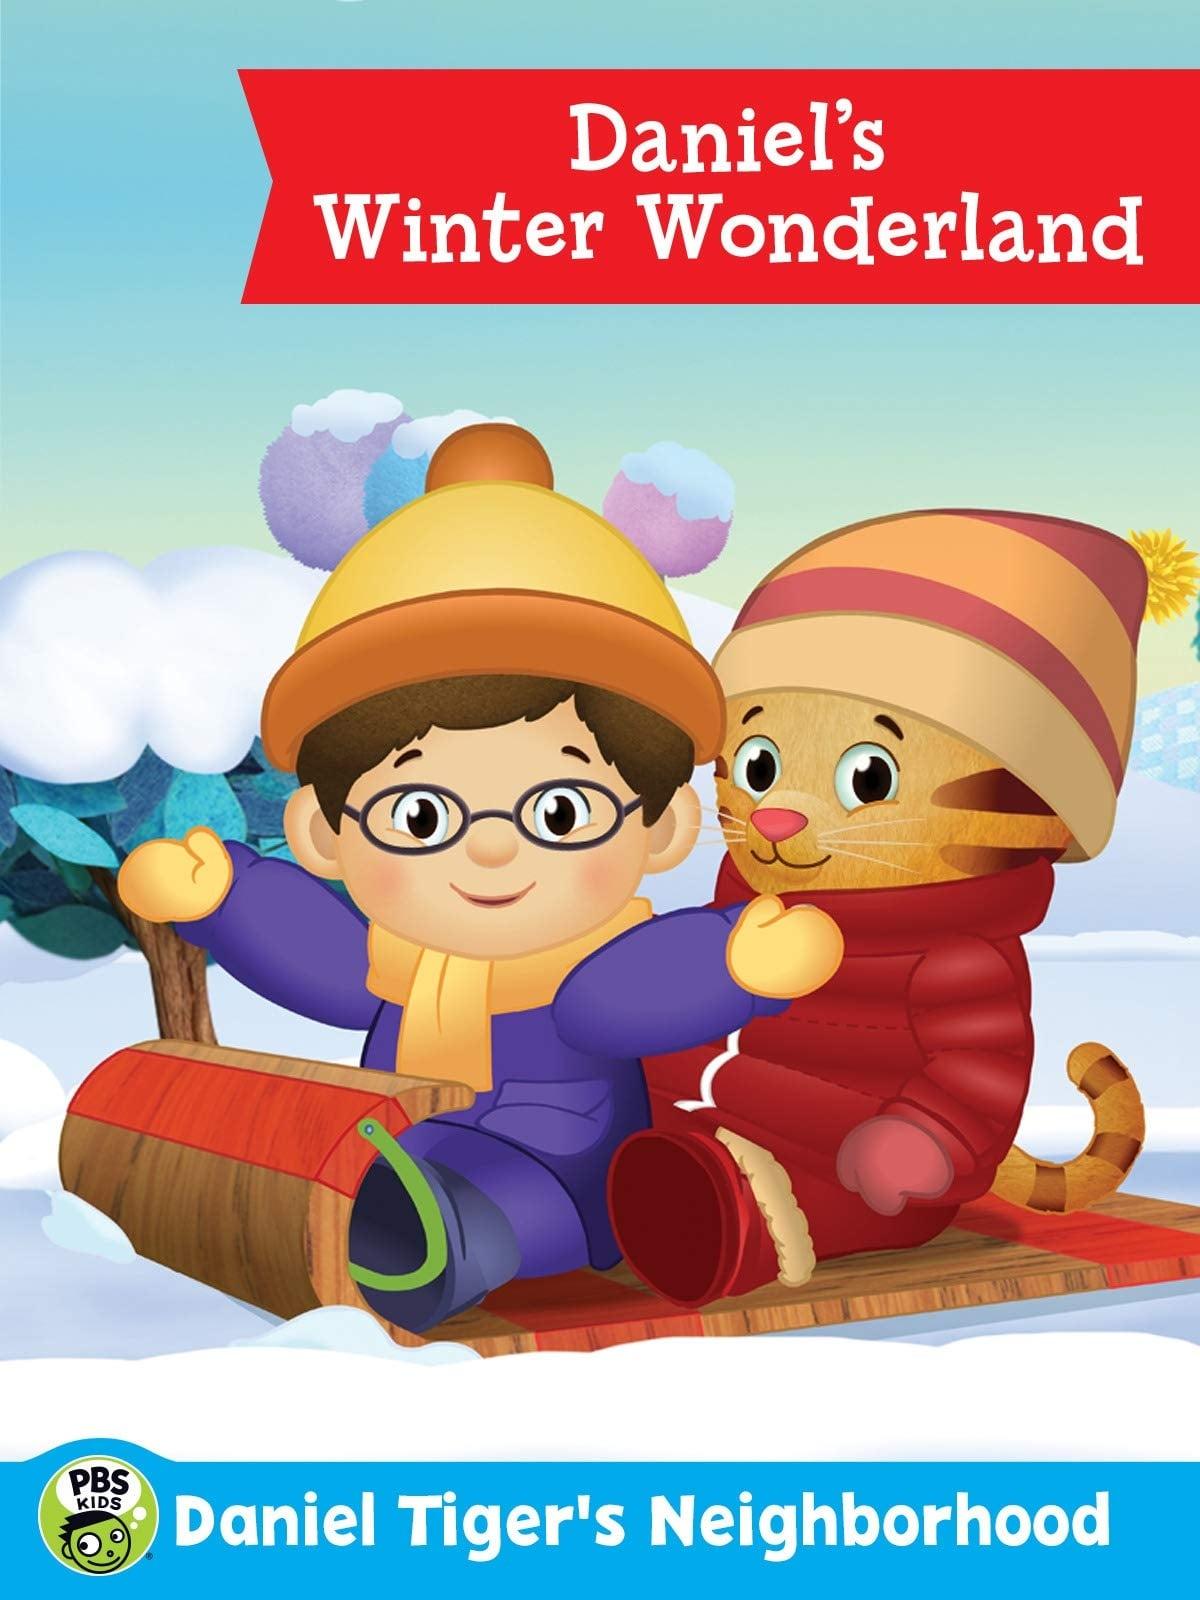 Daniel Tiger's Neighborhood: Daniel's Winter Wonderland